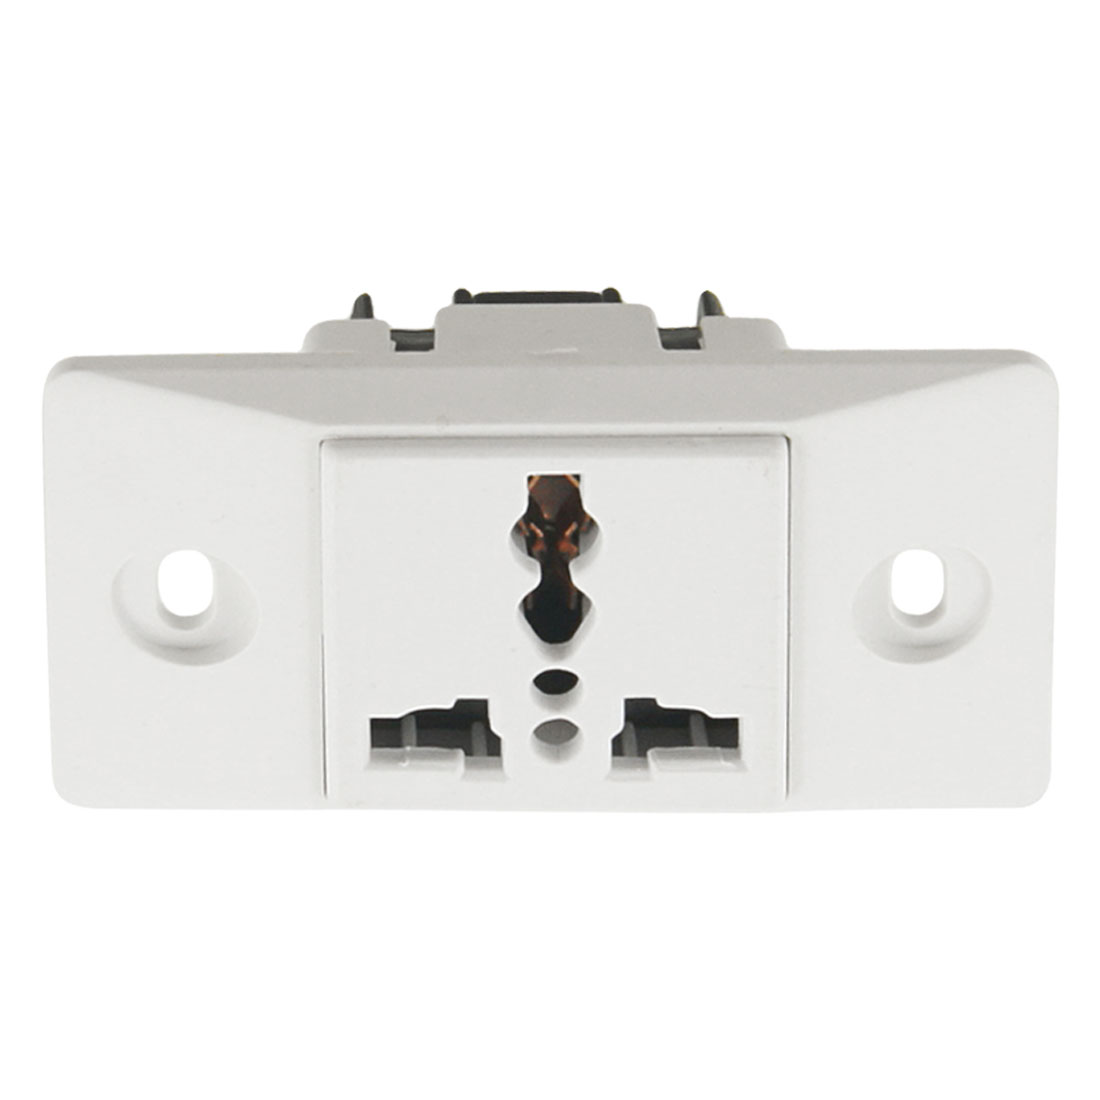 10A 250V Socket Outlet Wall Plate EU UK US Plug